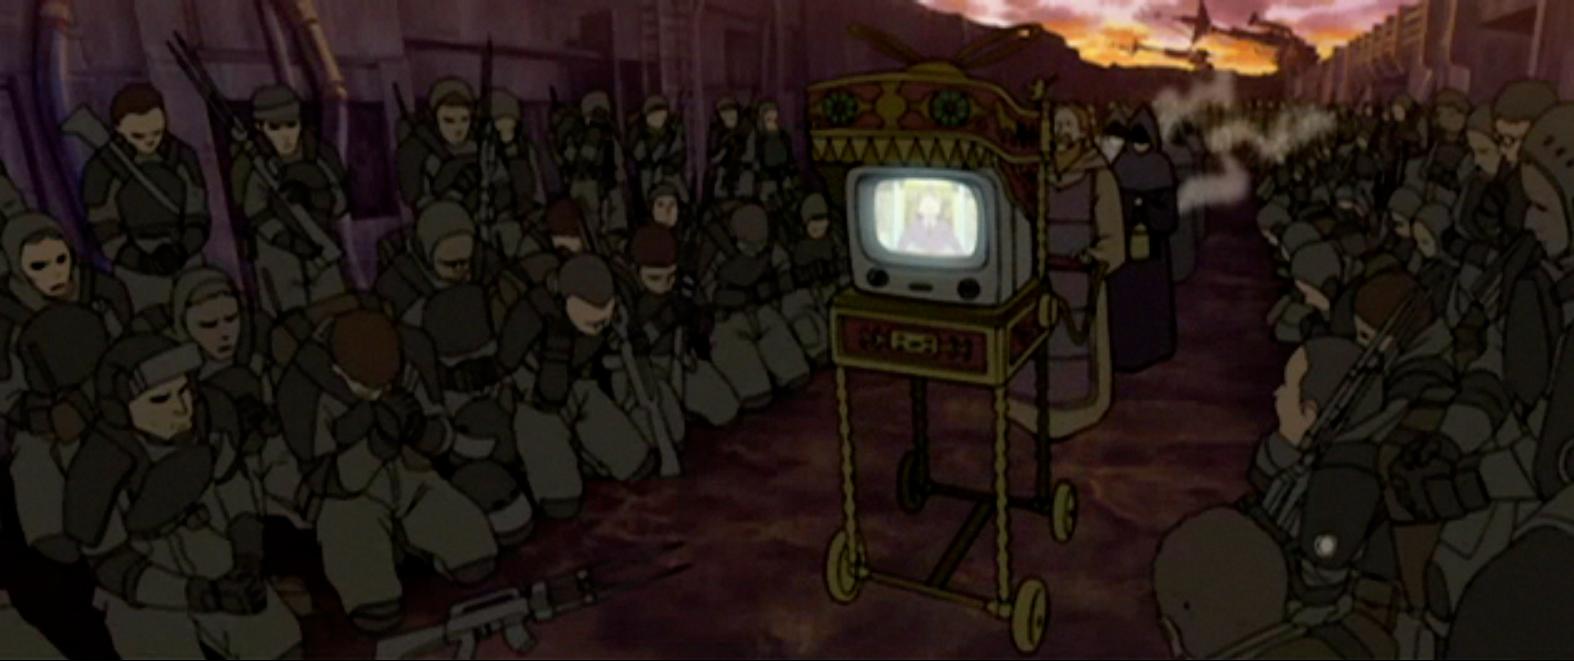 Weakest Ground Force To Help Matrix Humanity Win The War